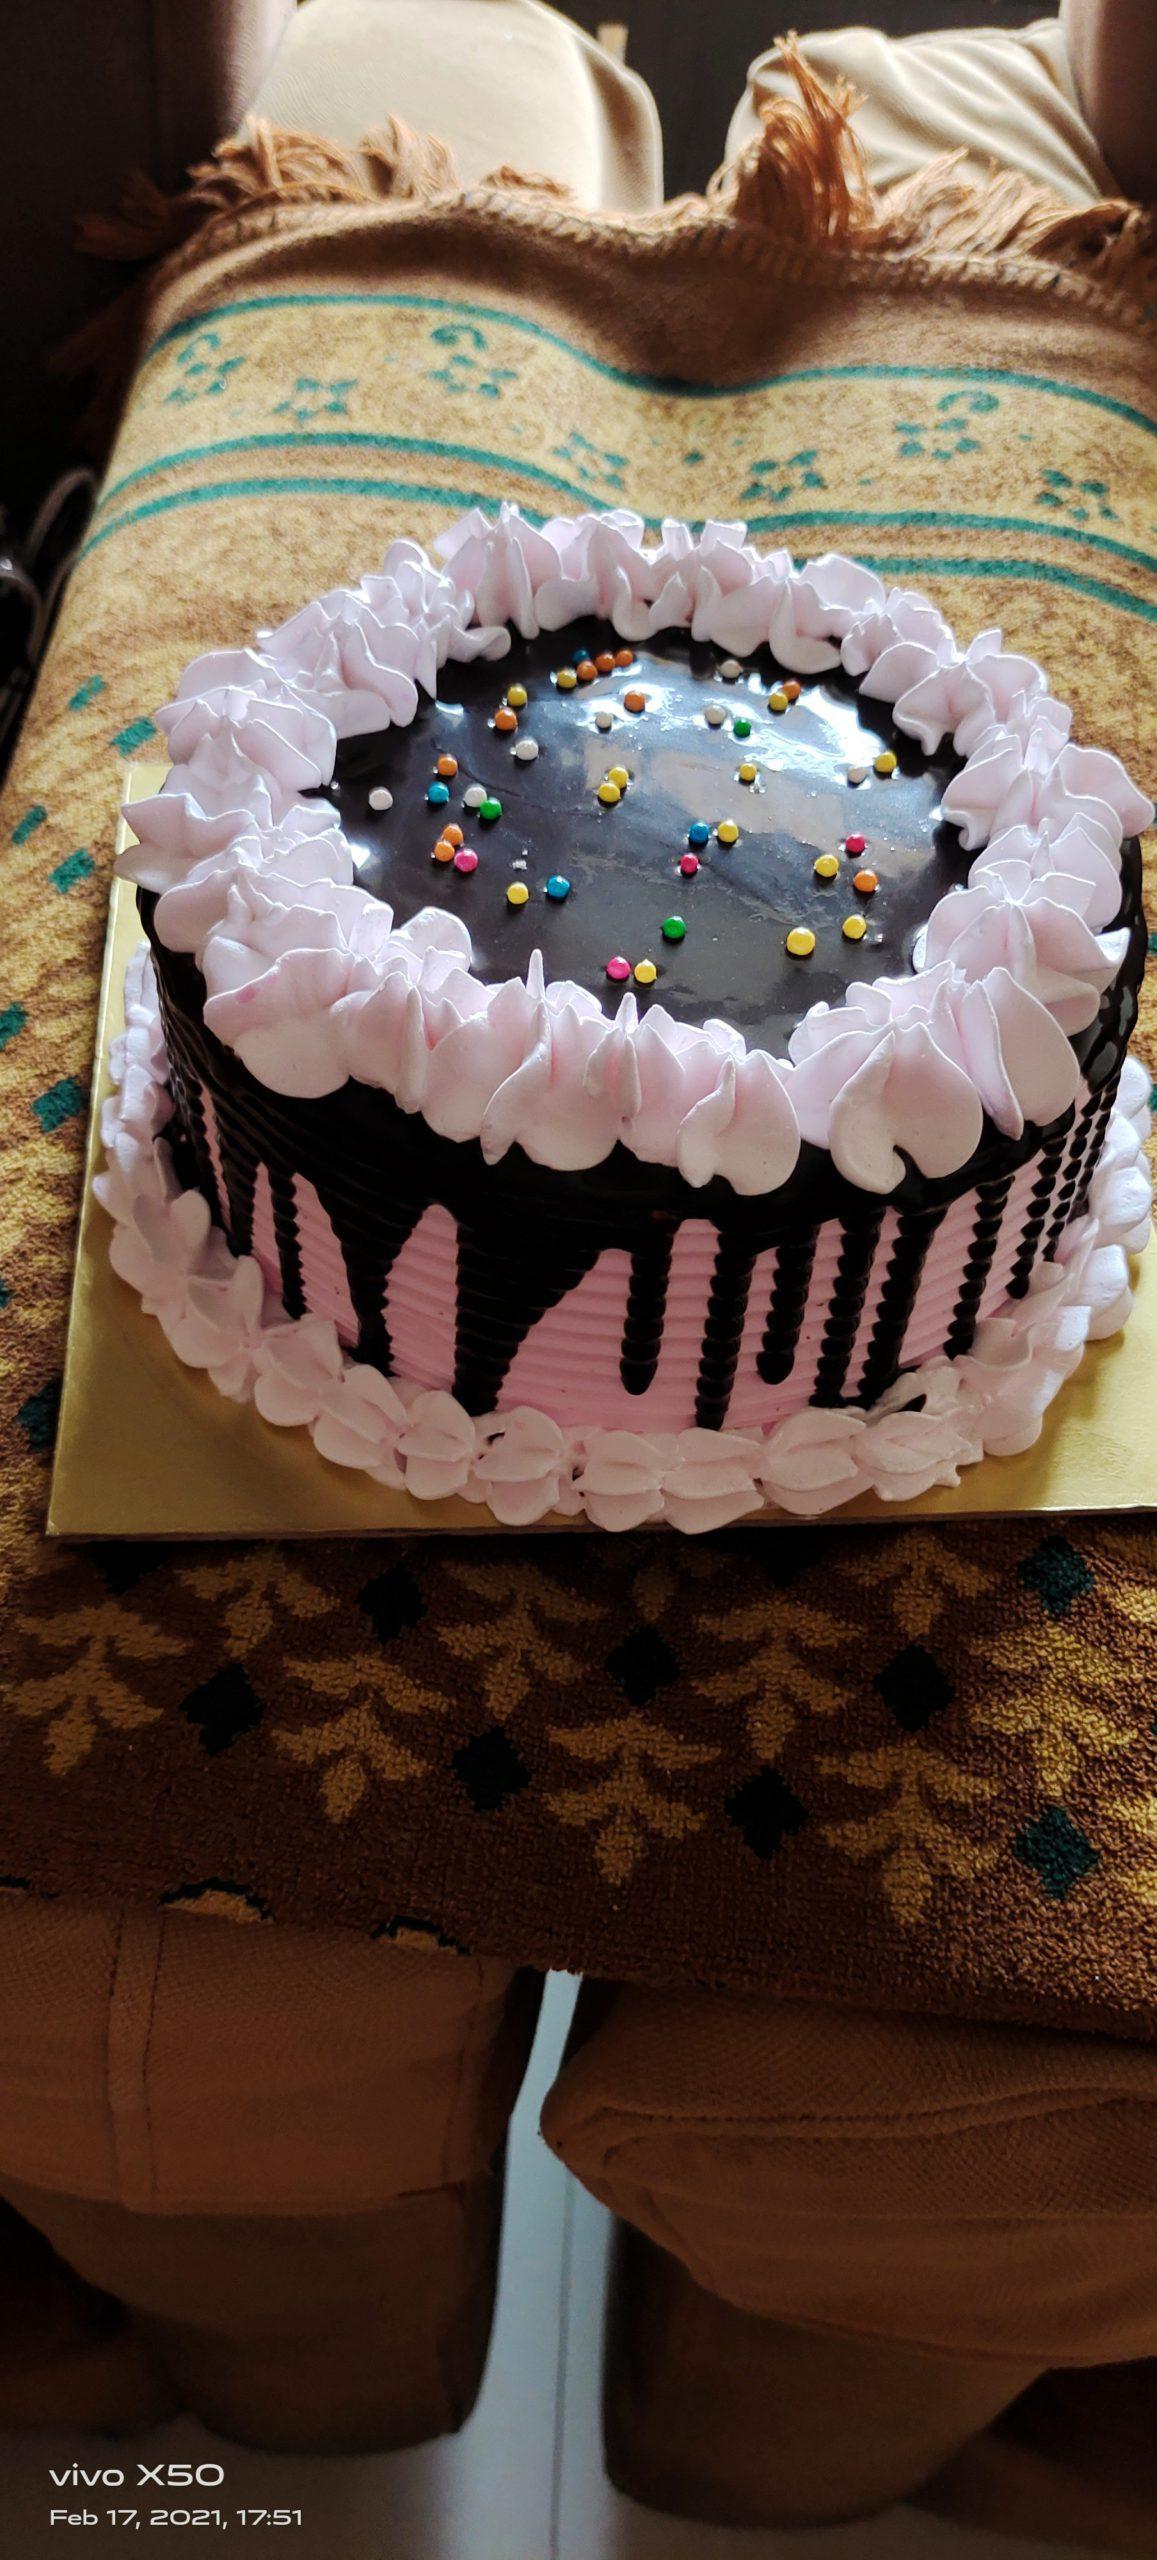 Dalgona Coffee Chocolate Cake Designs, Images, Price Near Me